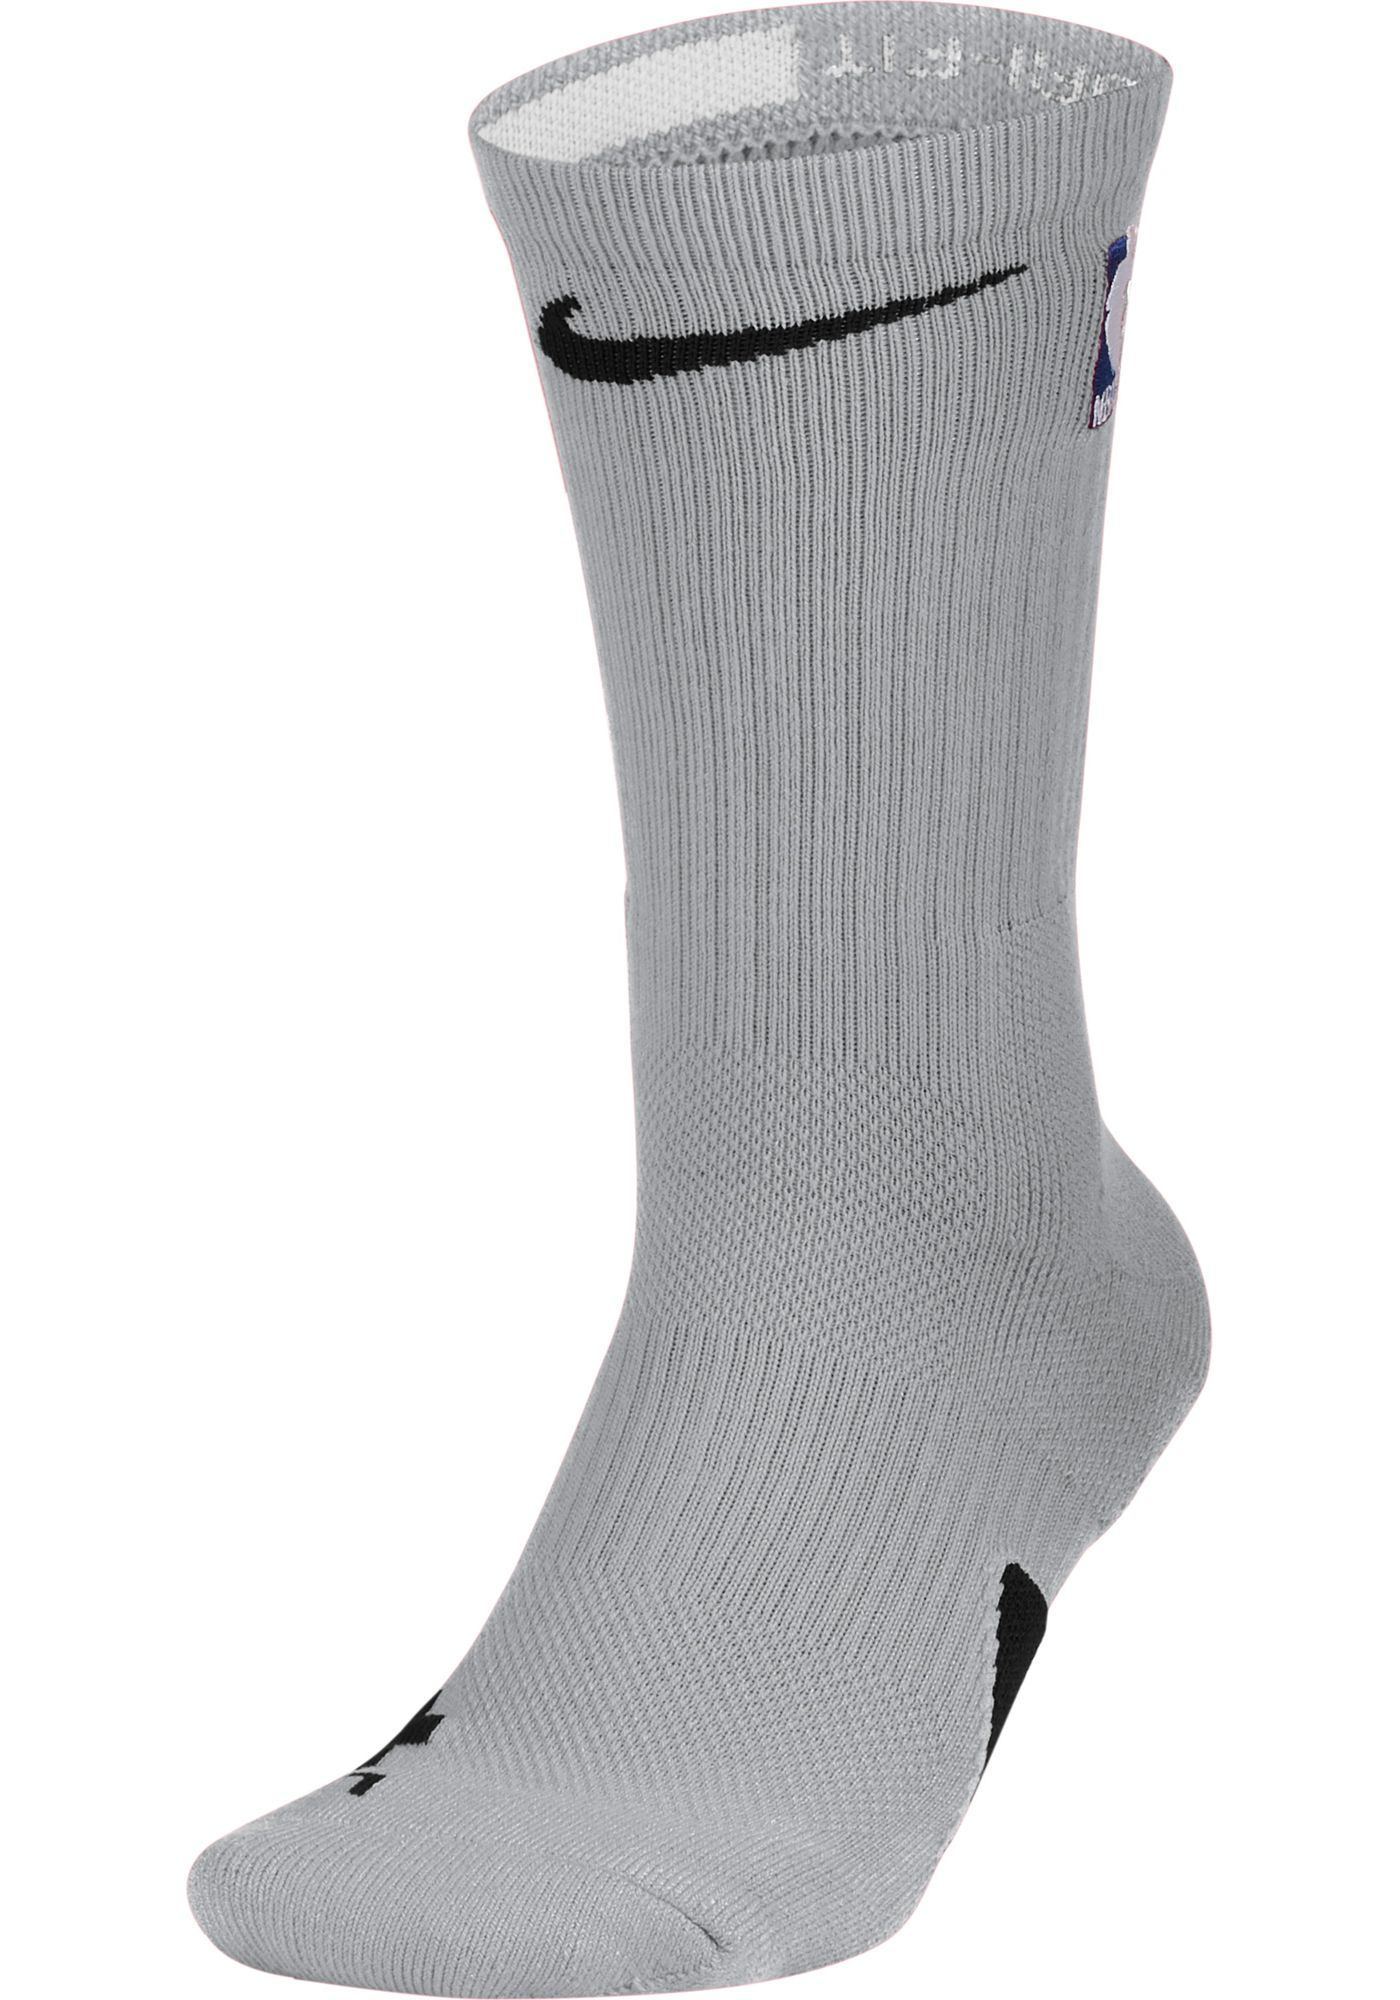 Nike NBA League Silver Elite Crew Socks